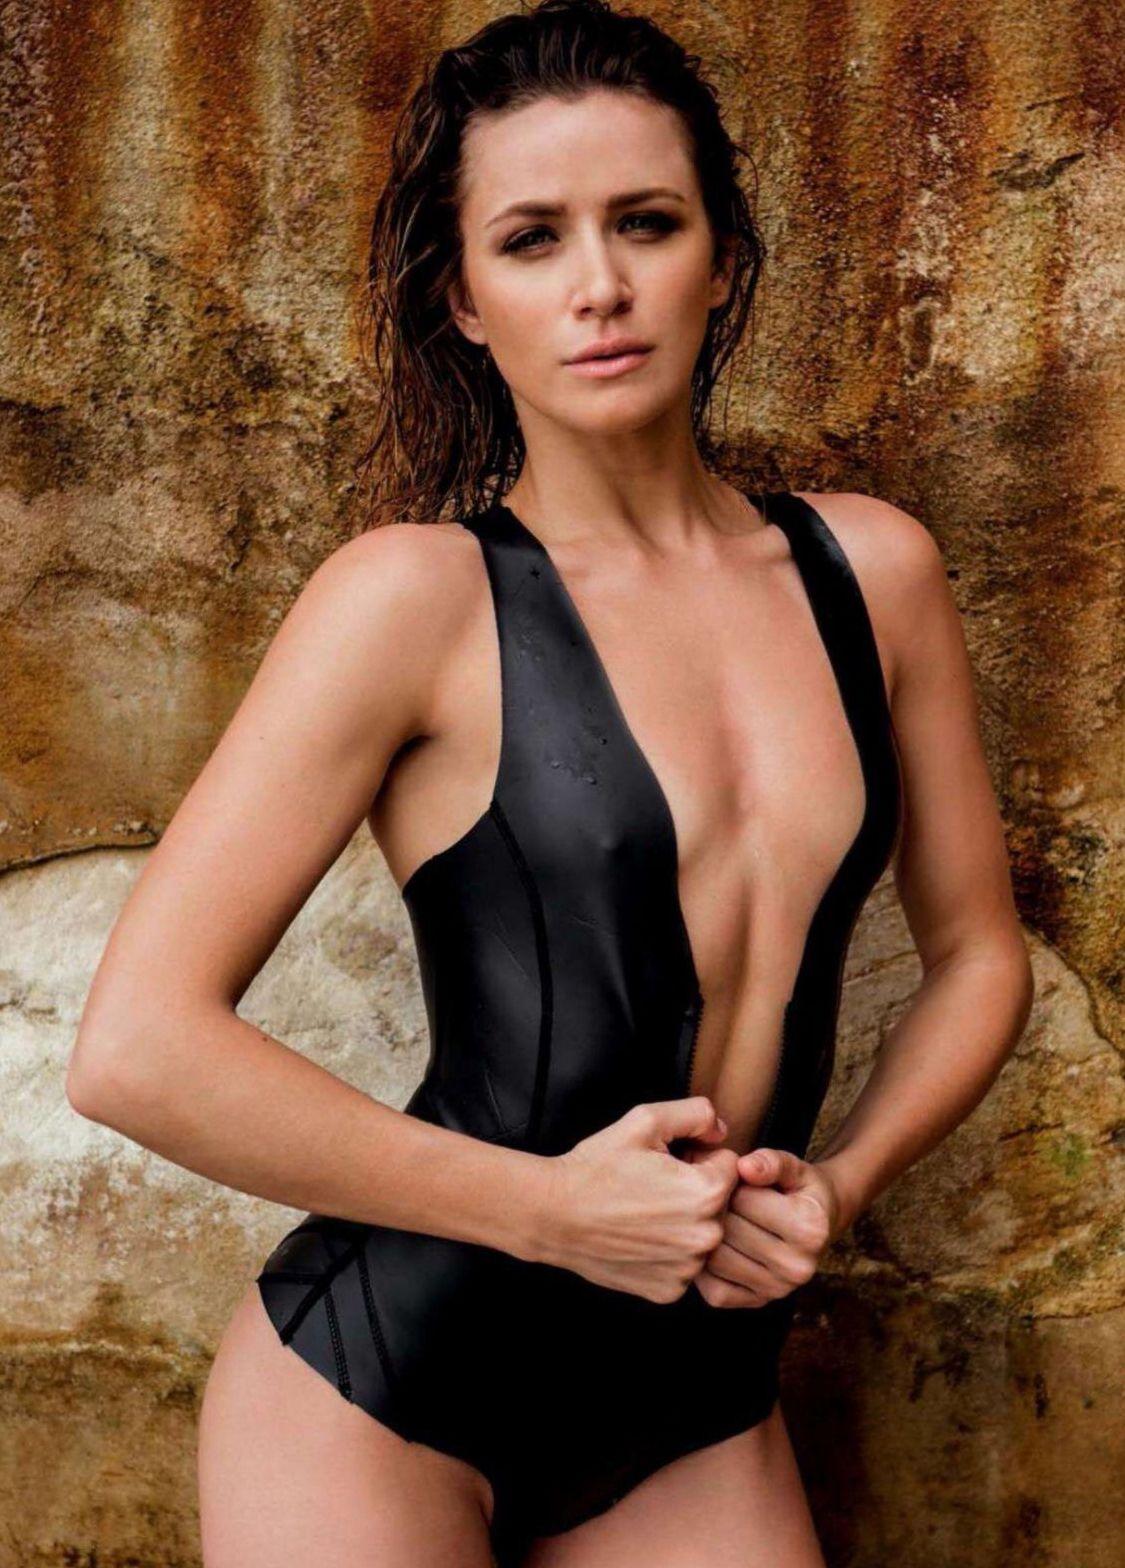 Images Angela Olszewska naked (82 photo), Topless, Bikini, Boobs, braless 2006